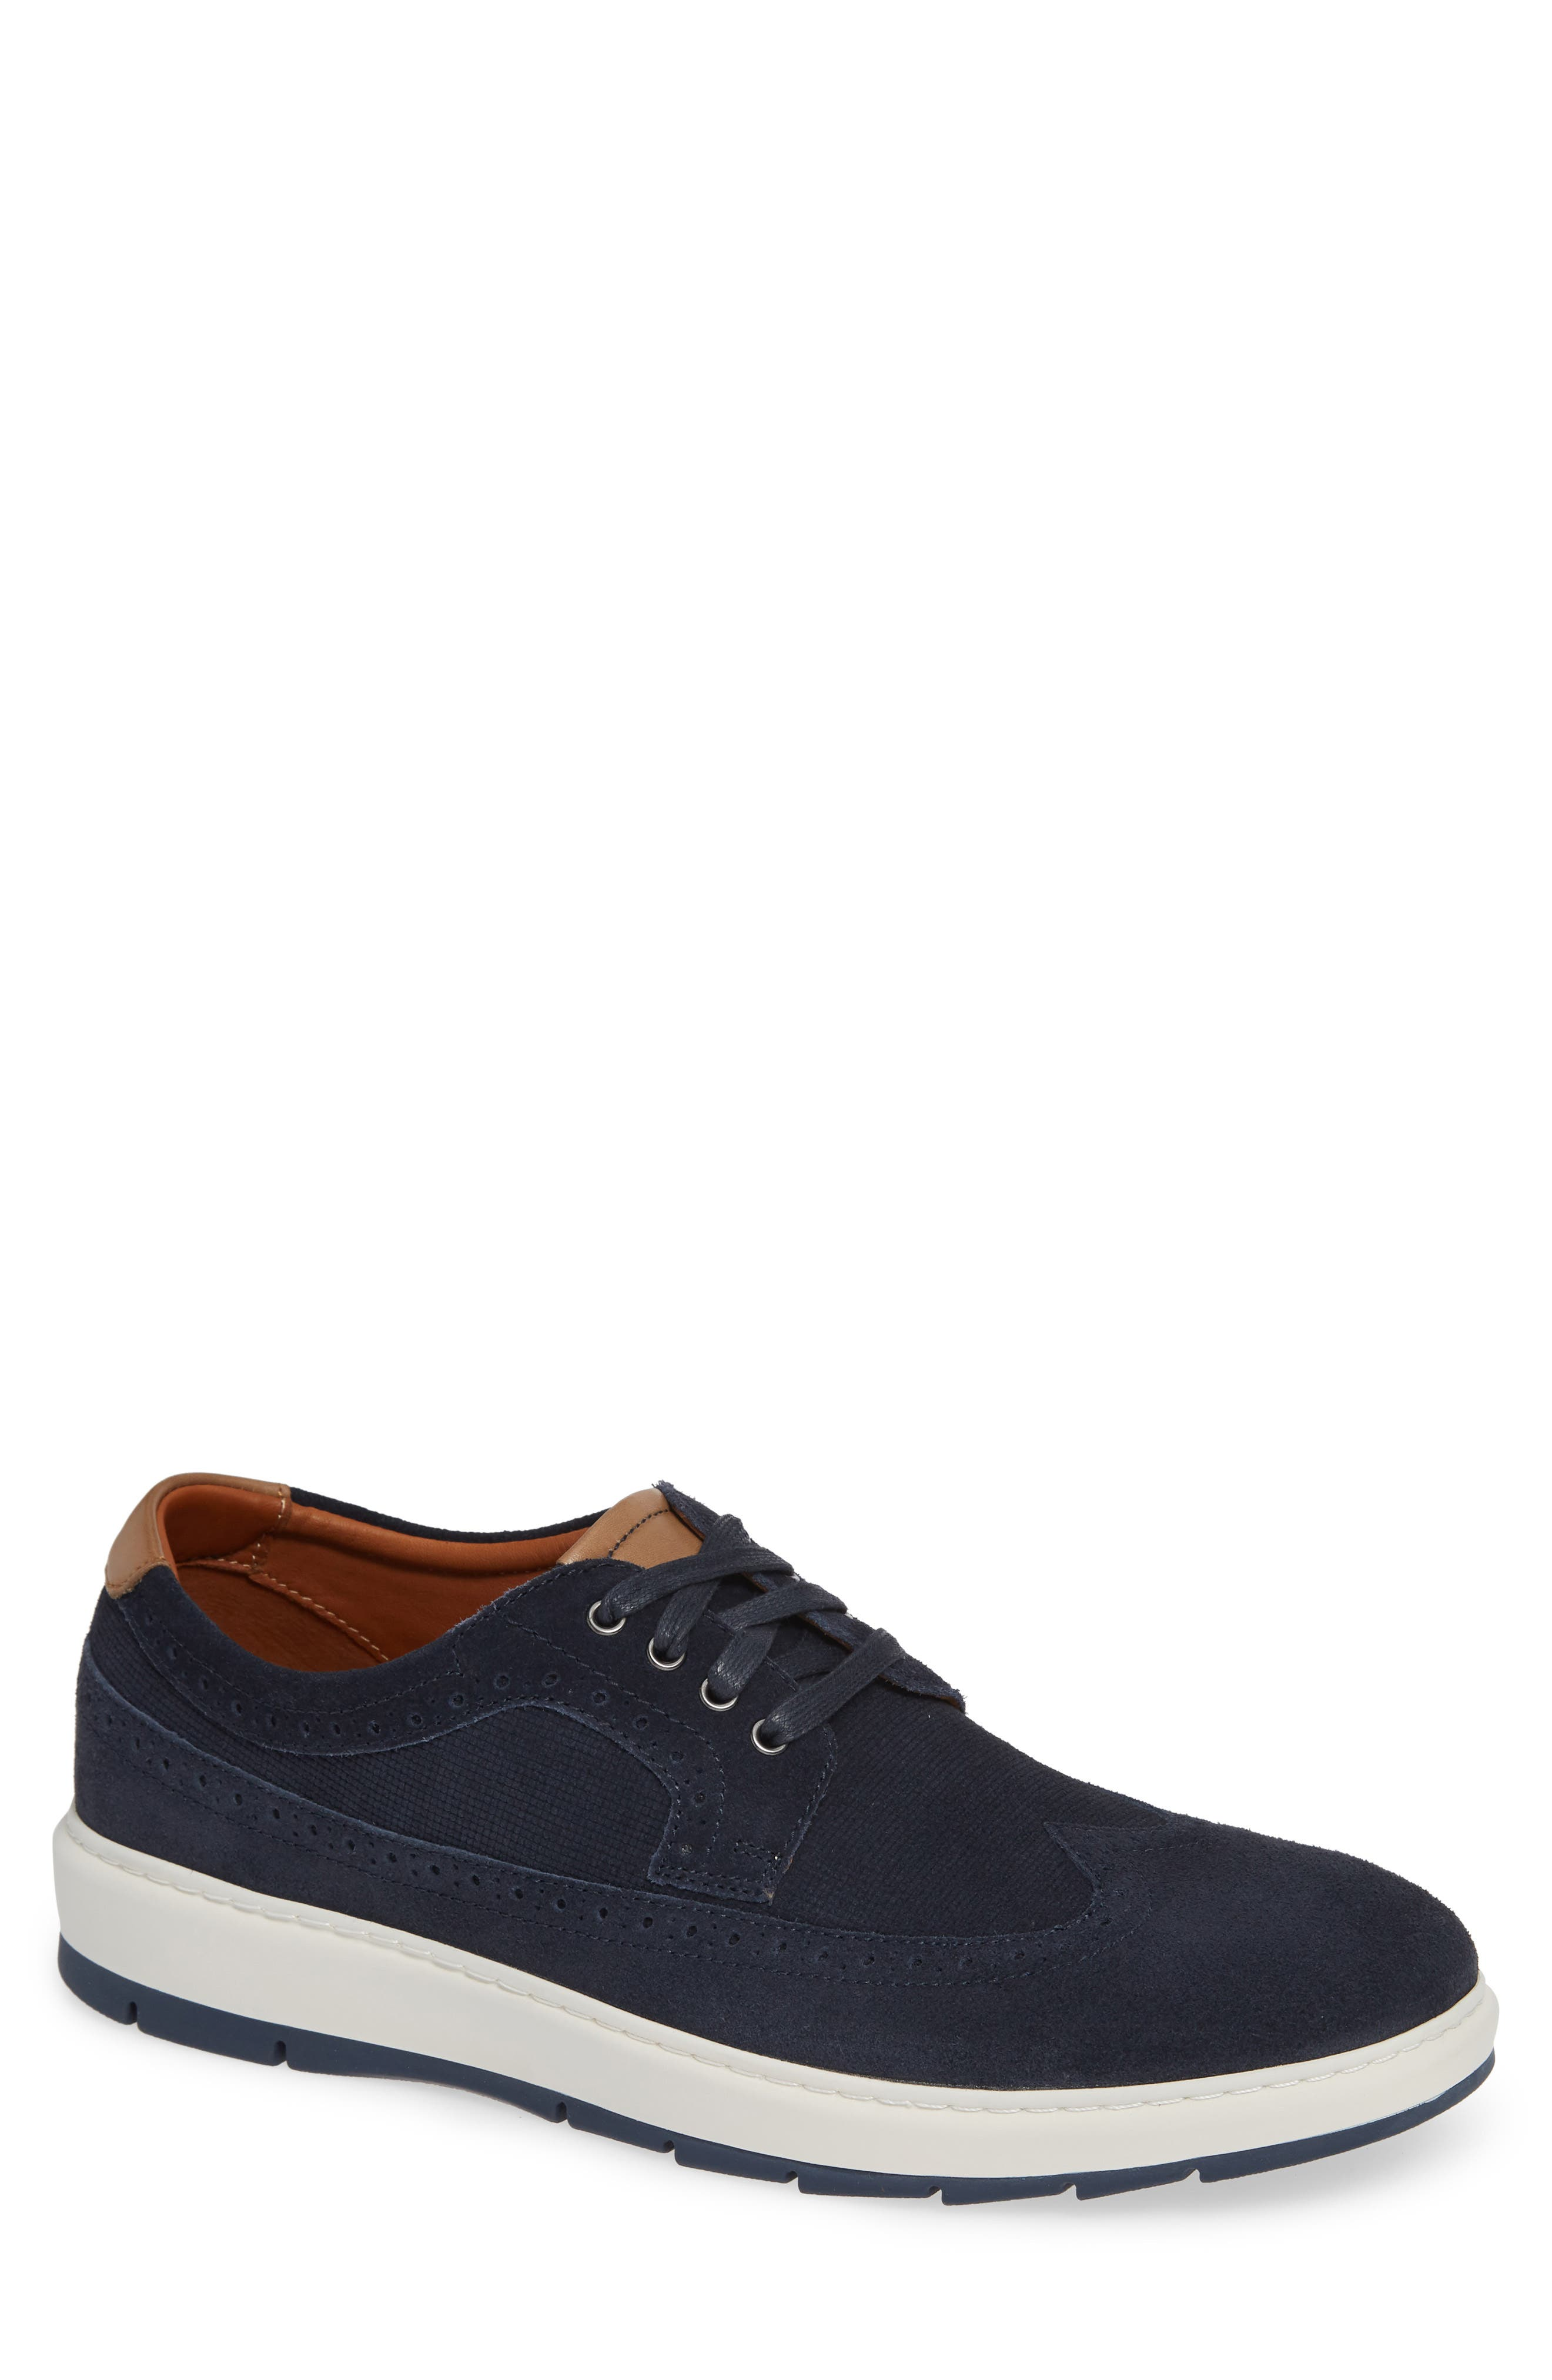 Johnston & Murphy Elliston Wingtip Sneaker, Blue